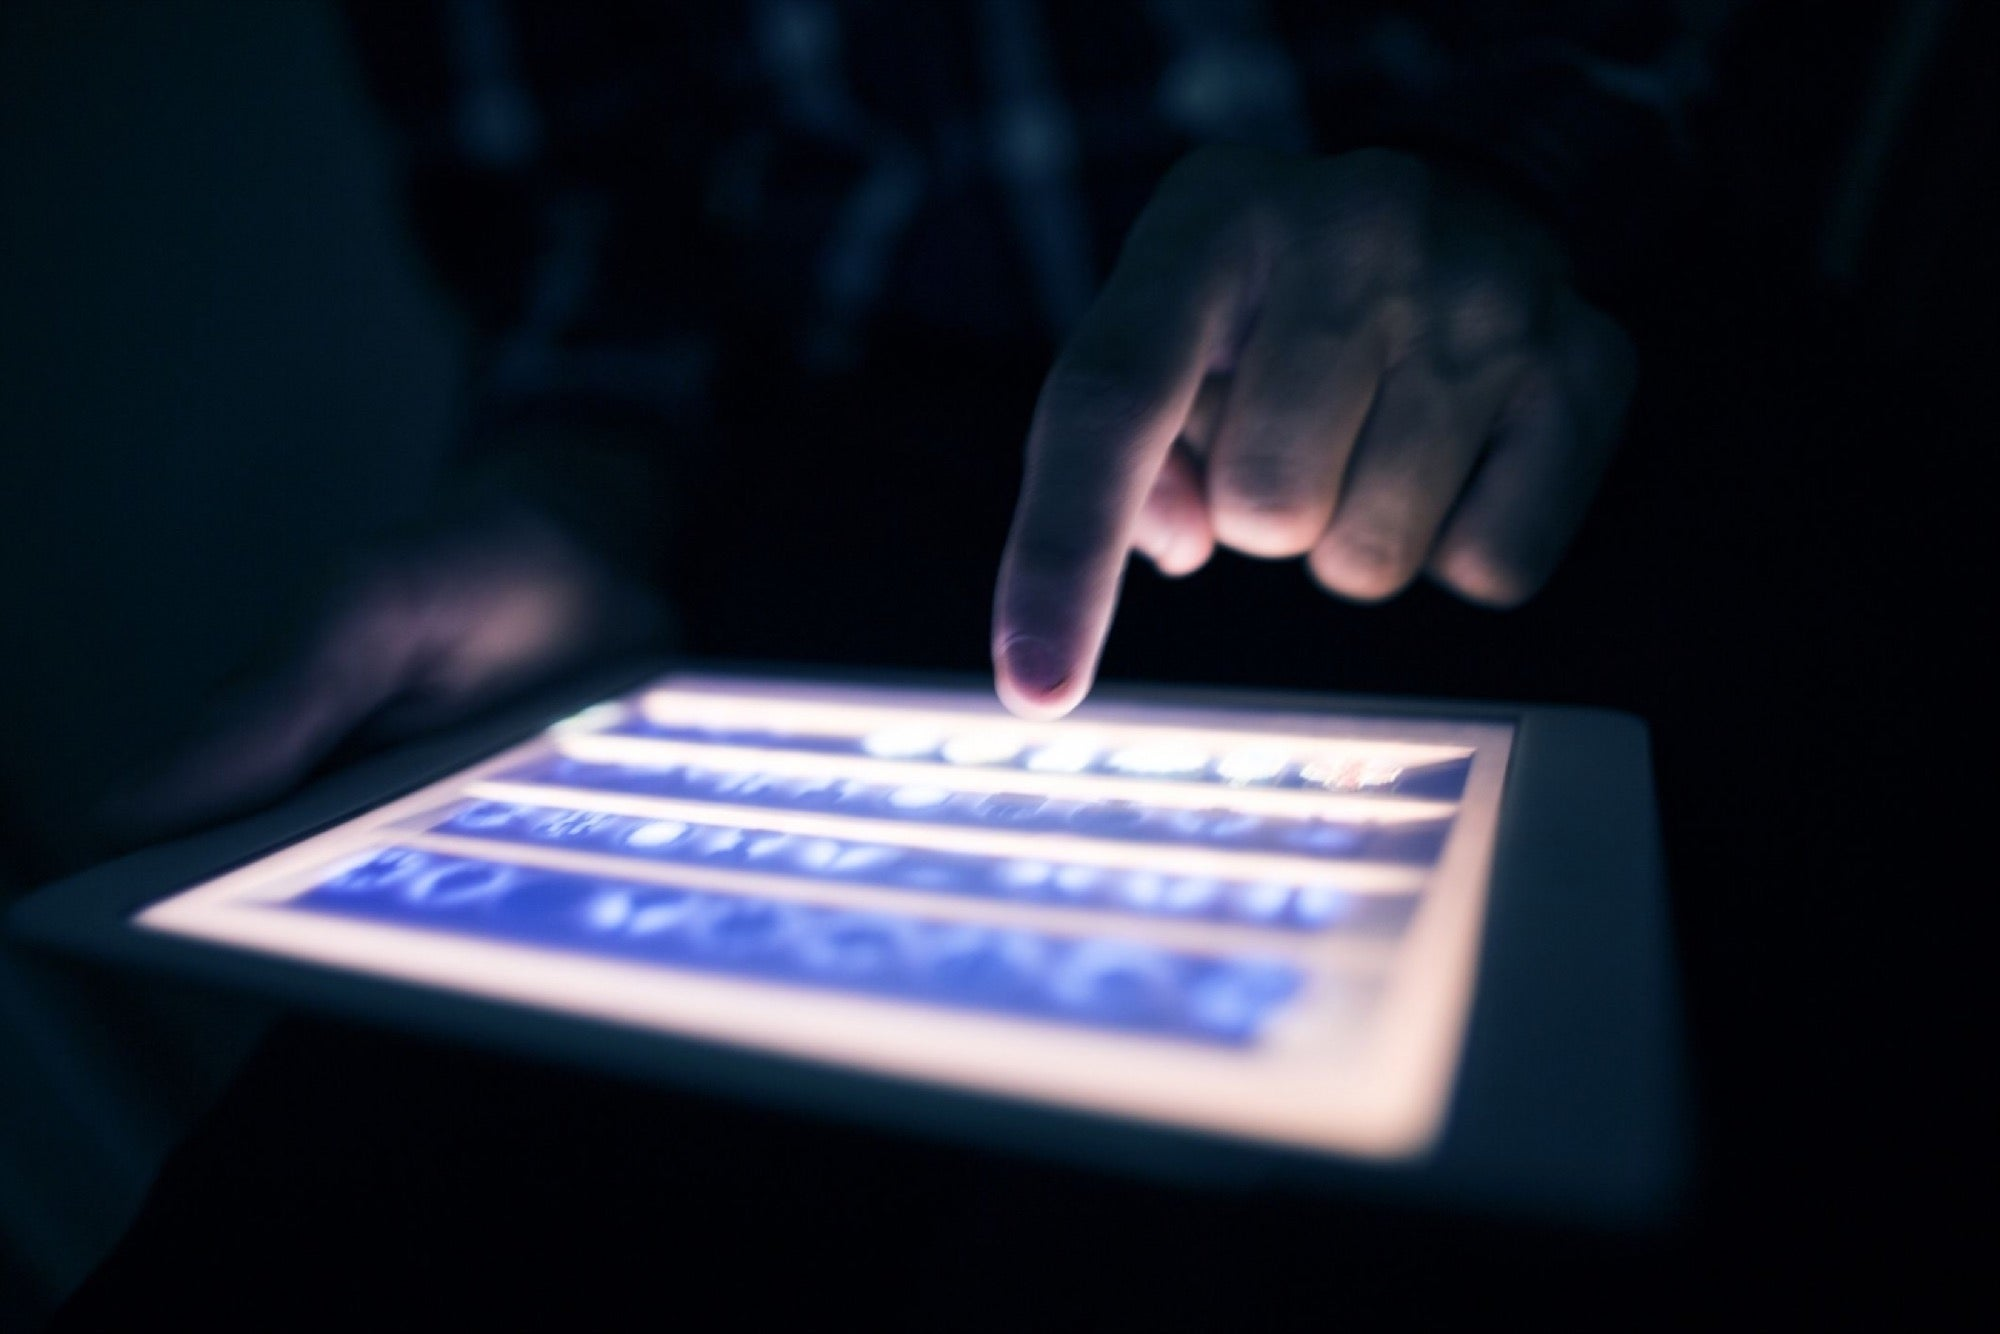 History online gambling procter gamble china strategy